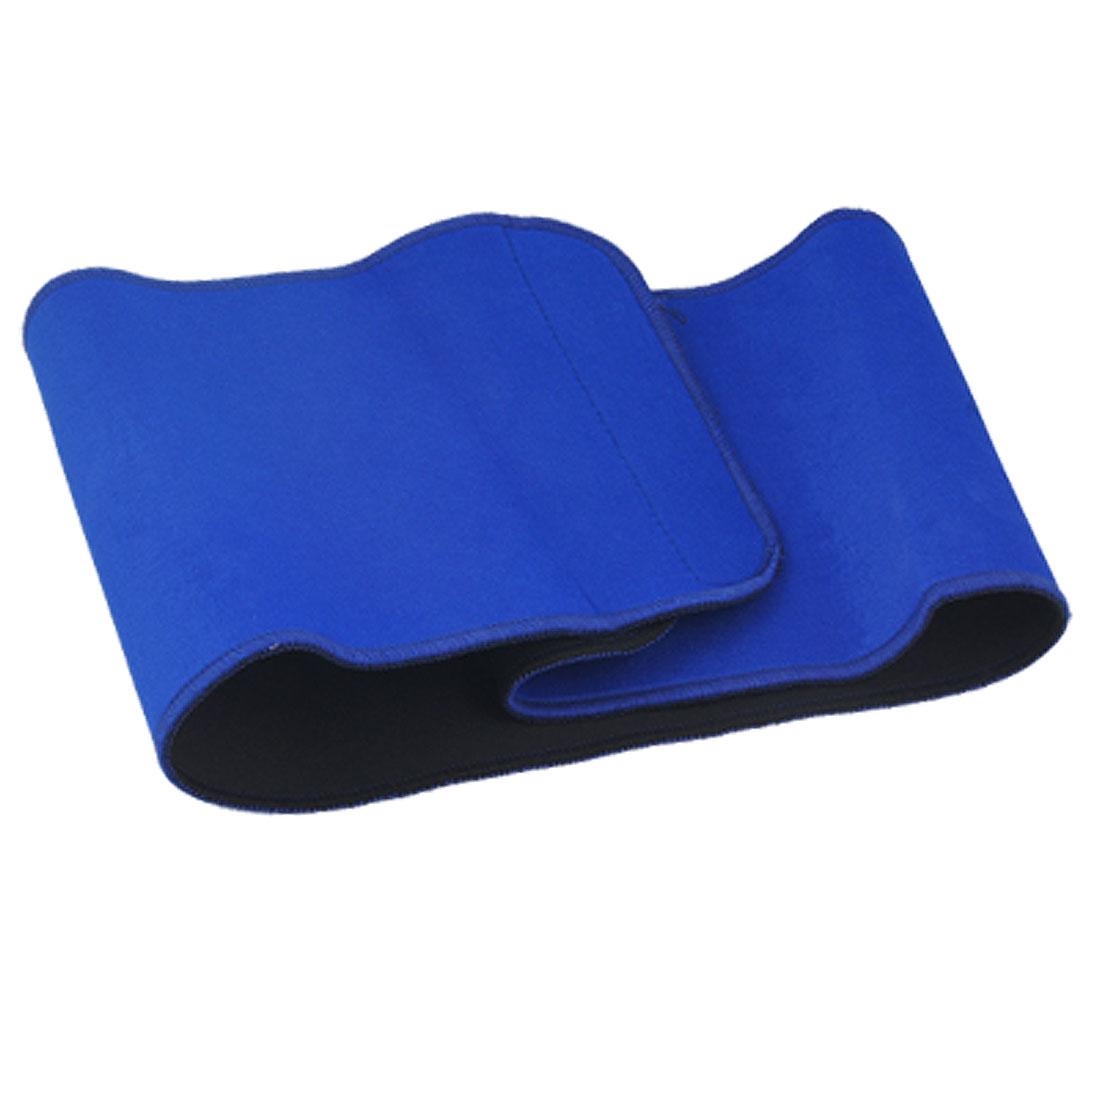 Blue Adjustable Waist Support Elastic Pain Back Brace